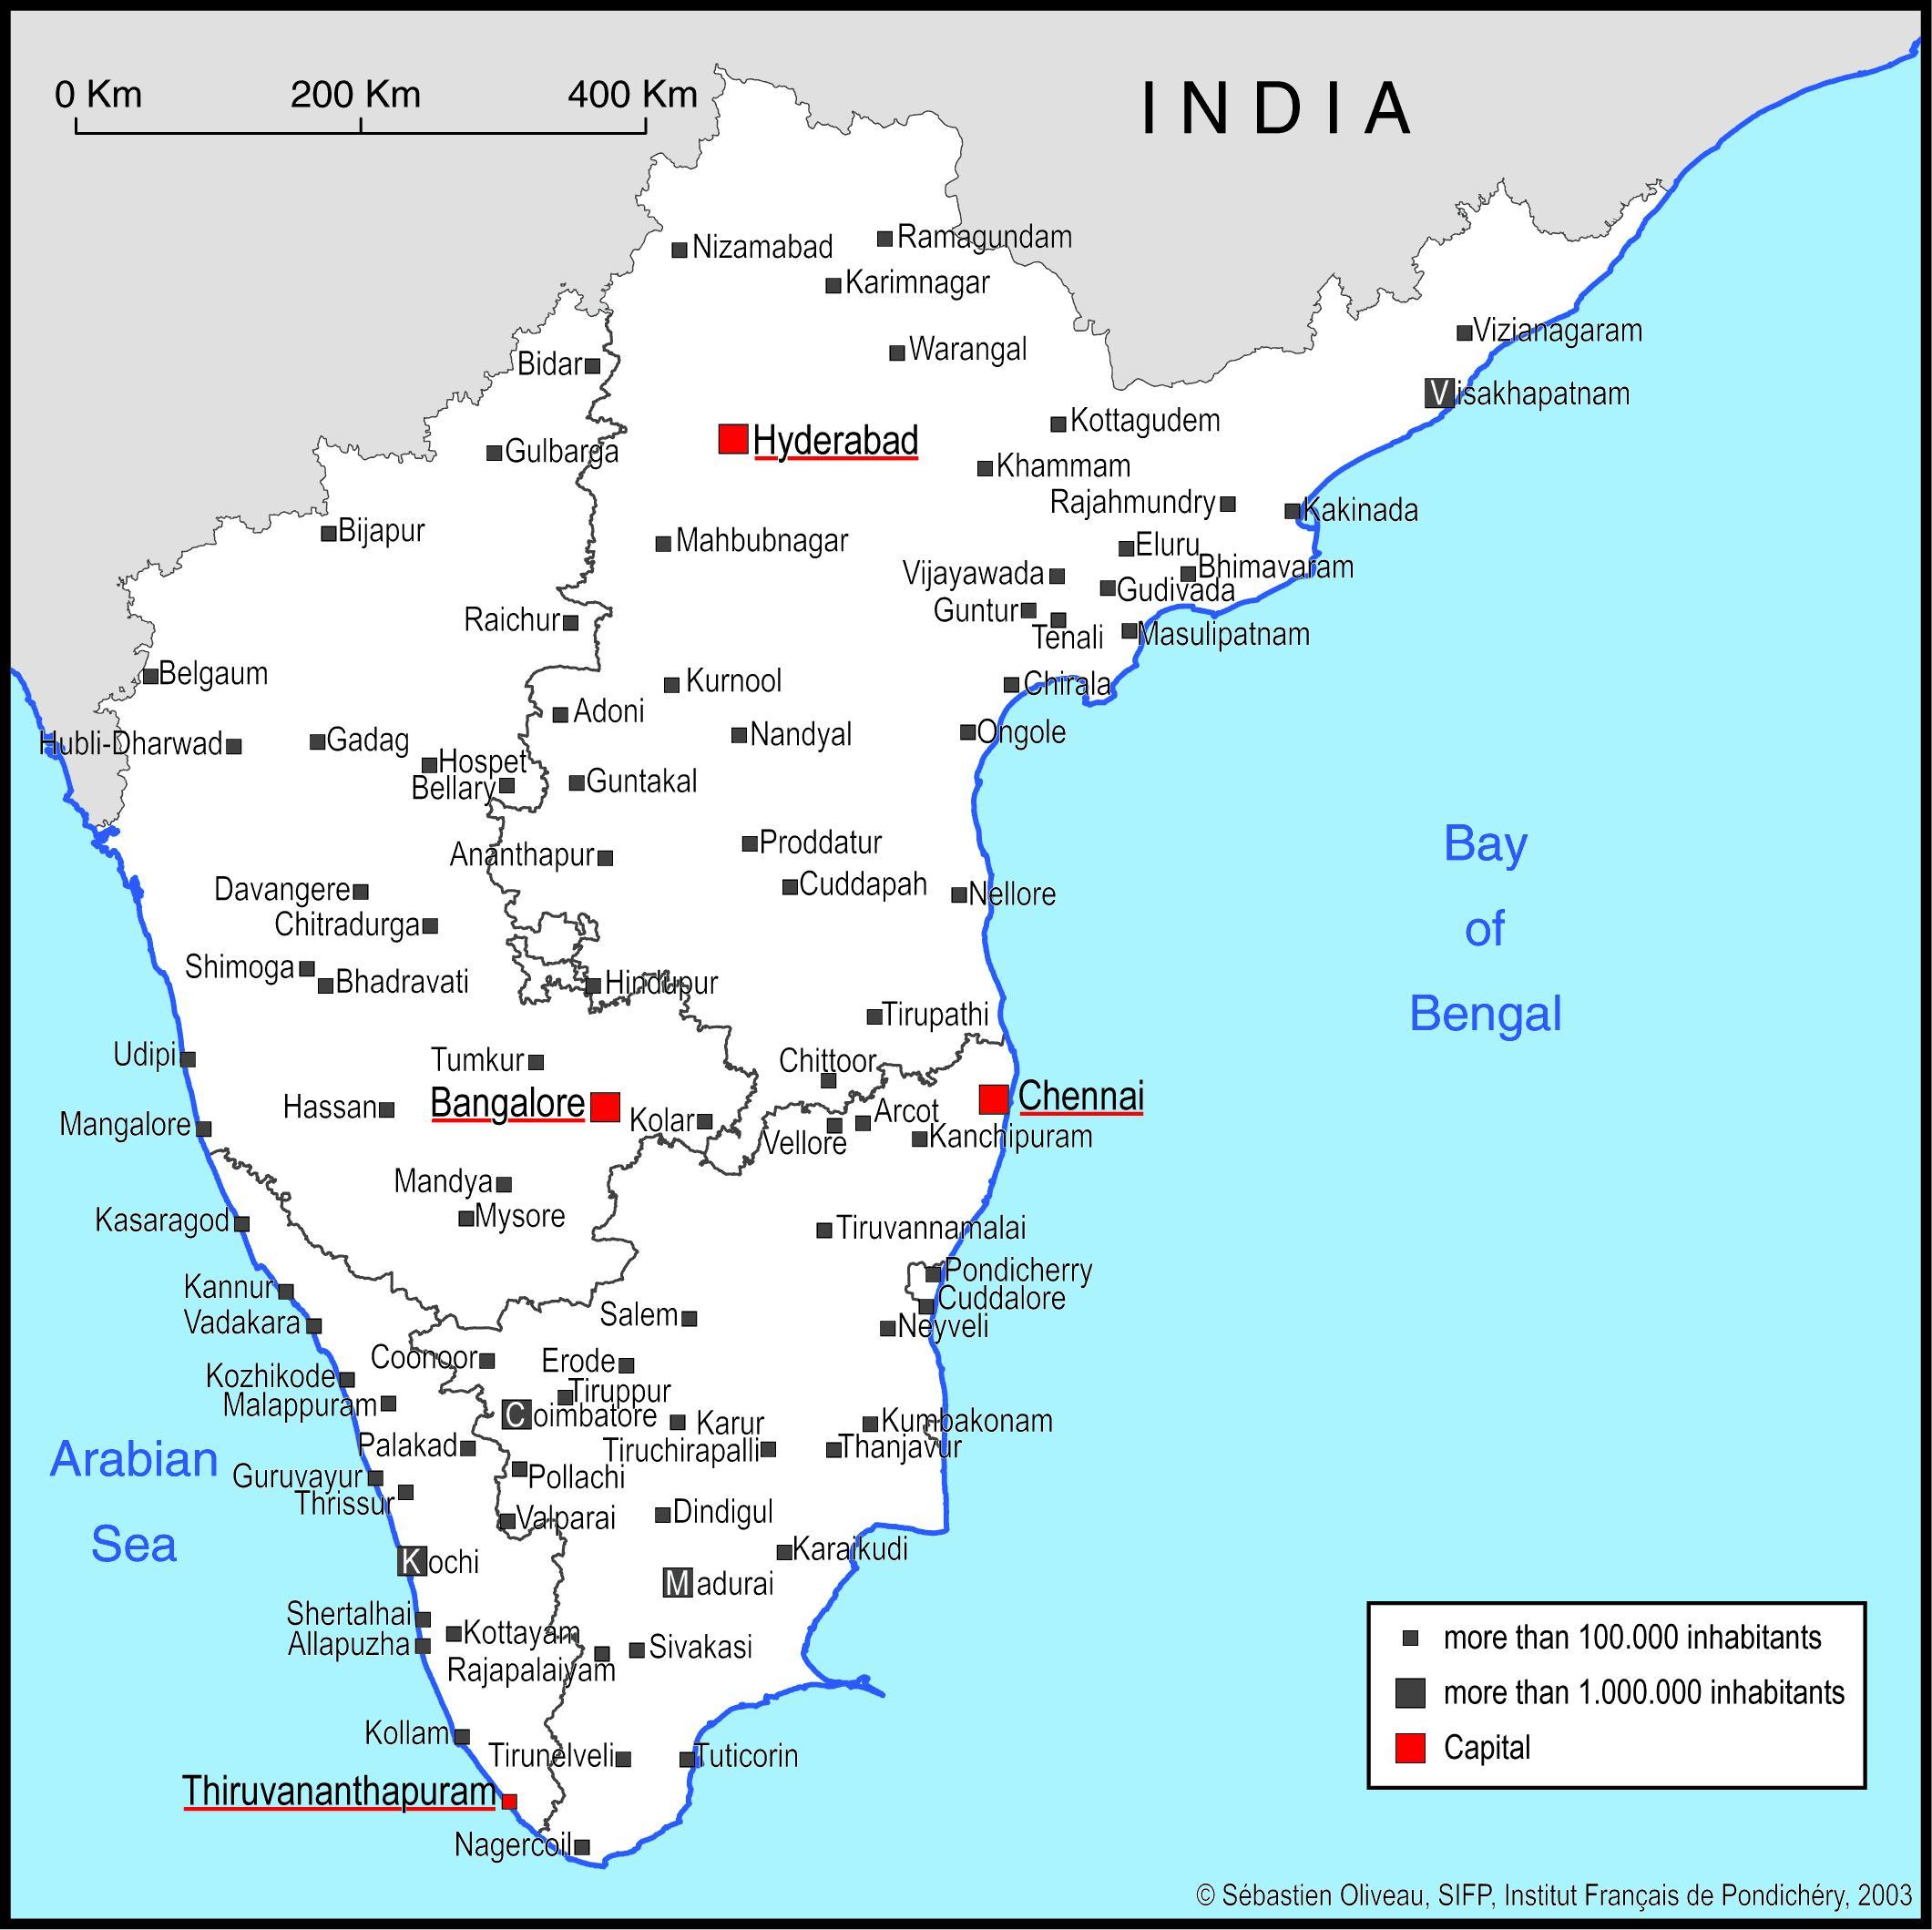 Carte Inde Principales Villes.Carte De L Inde Du Sud Avec Les Principales Villes Du Sud De